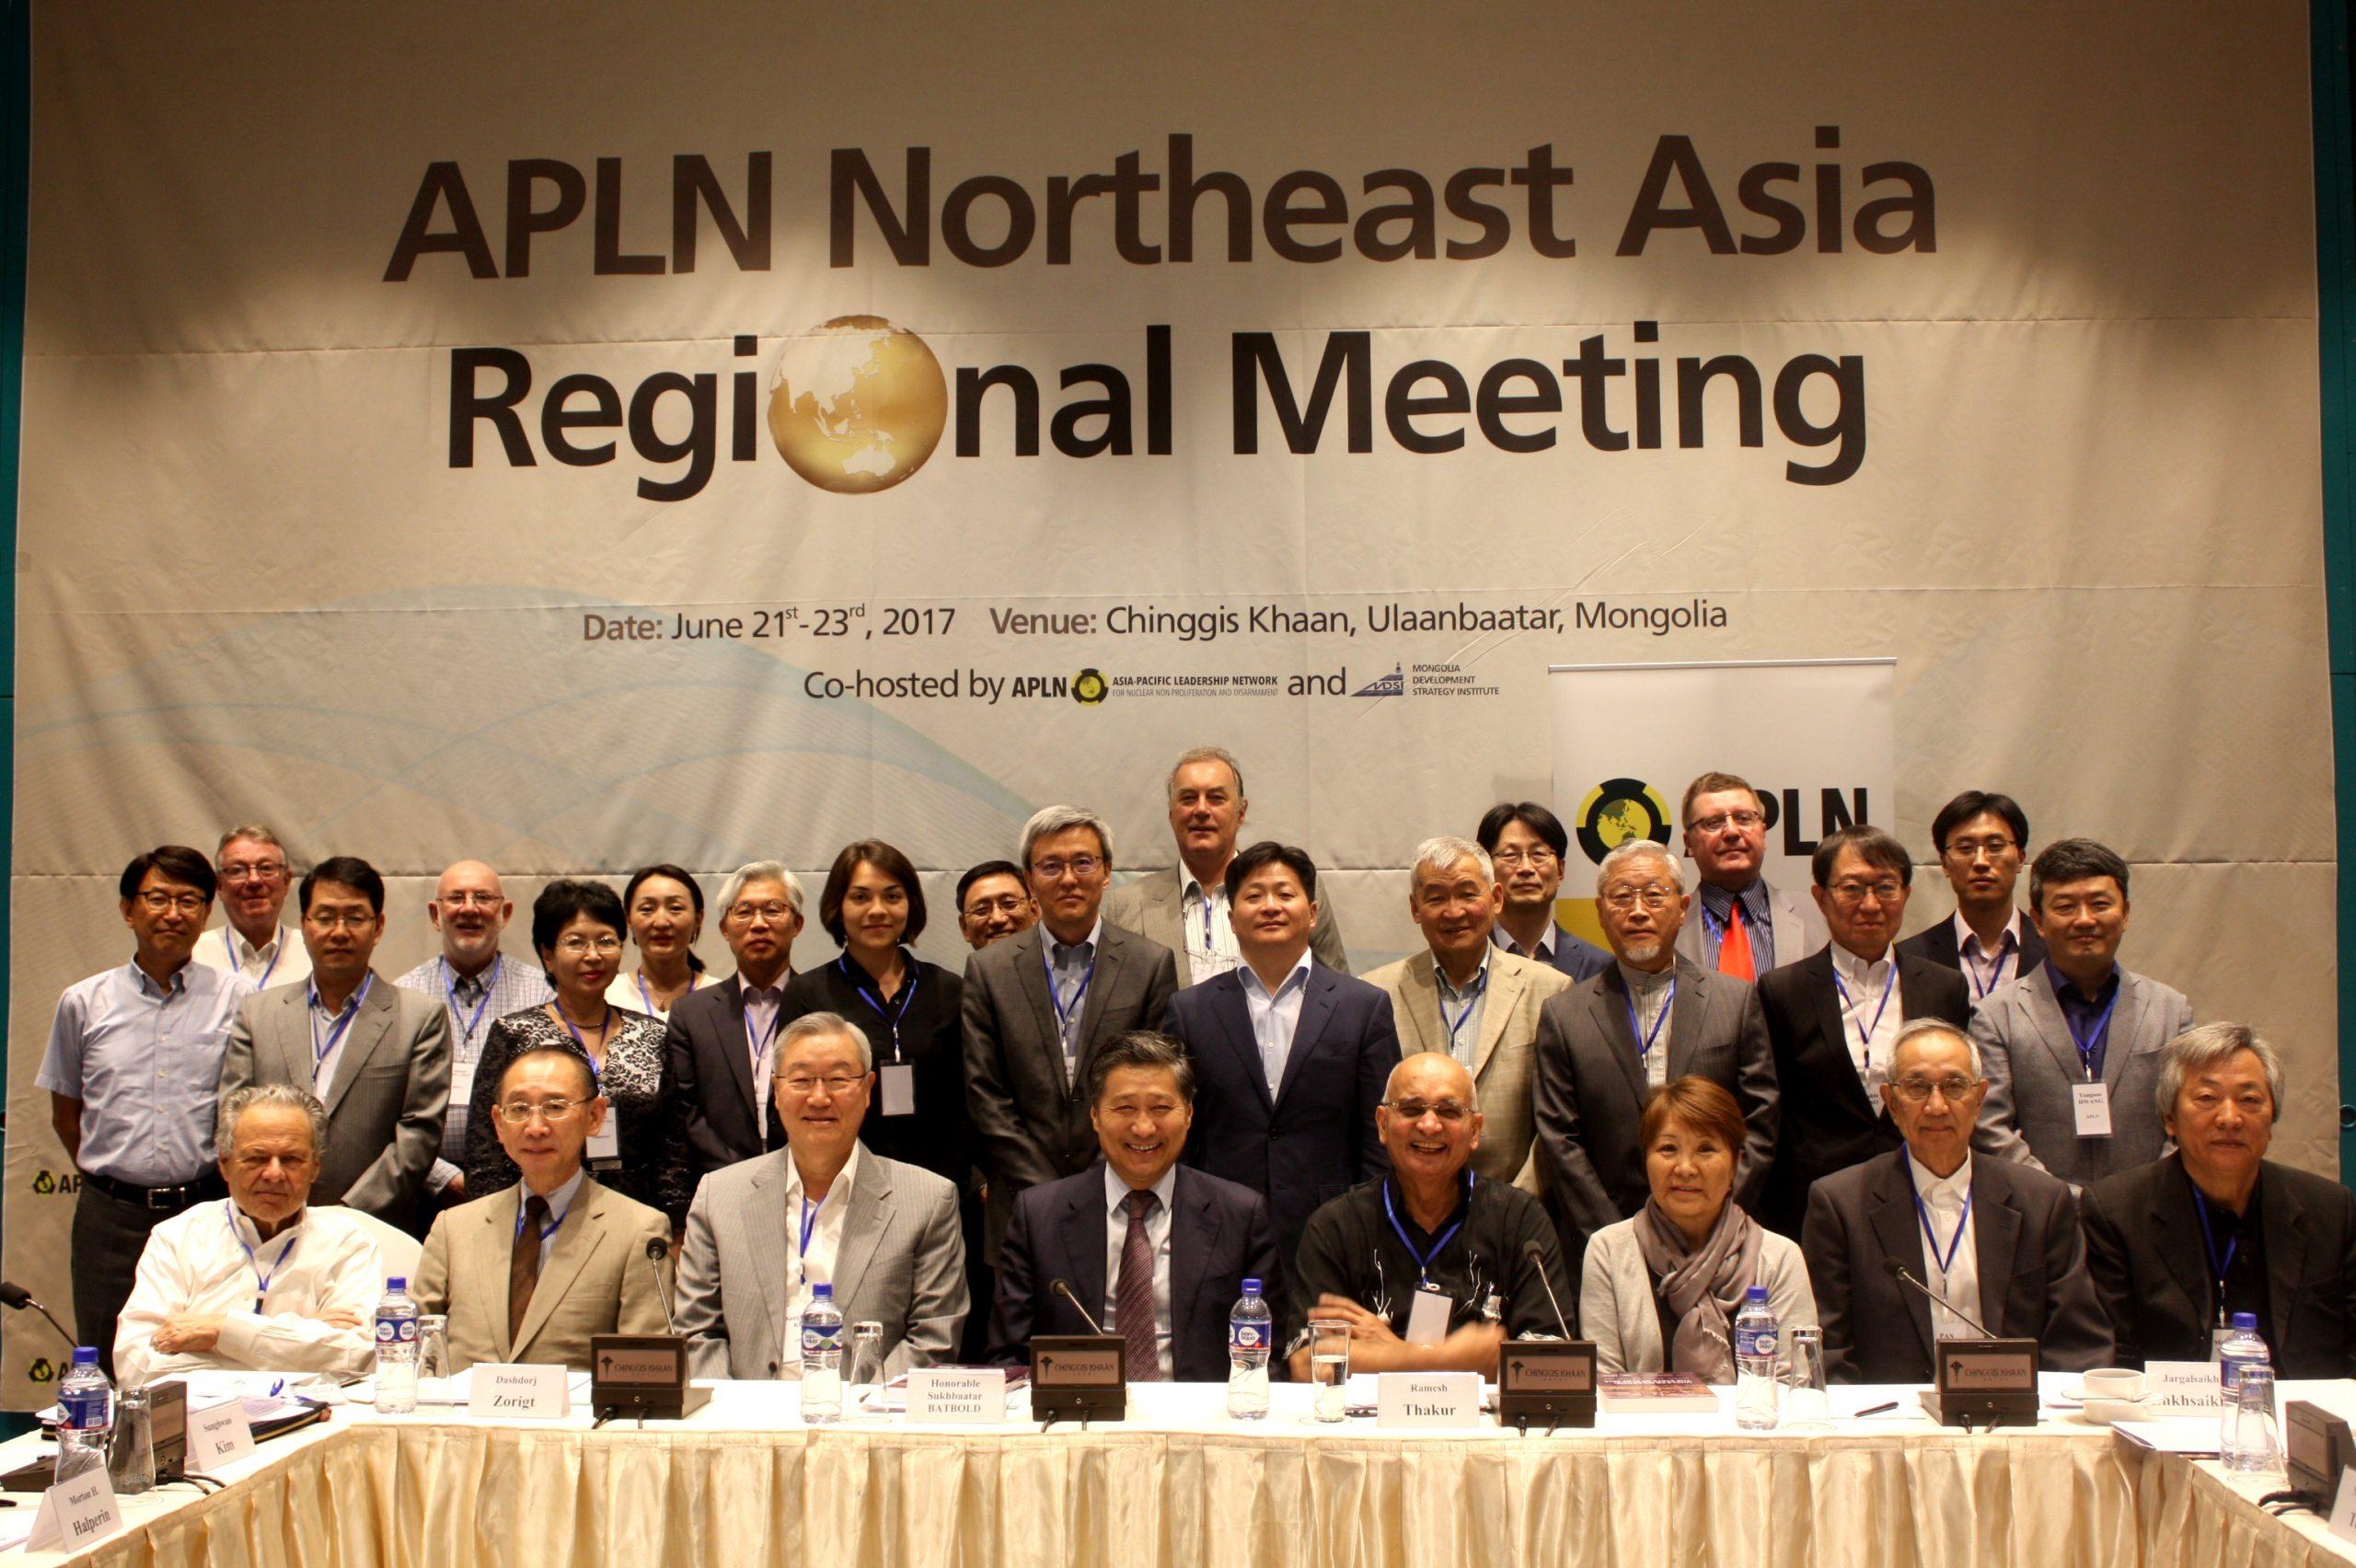 Northeast Asia Regional Meeting 2017